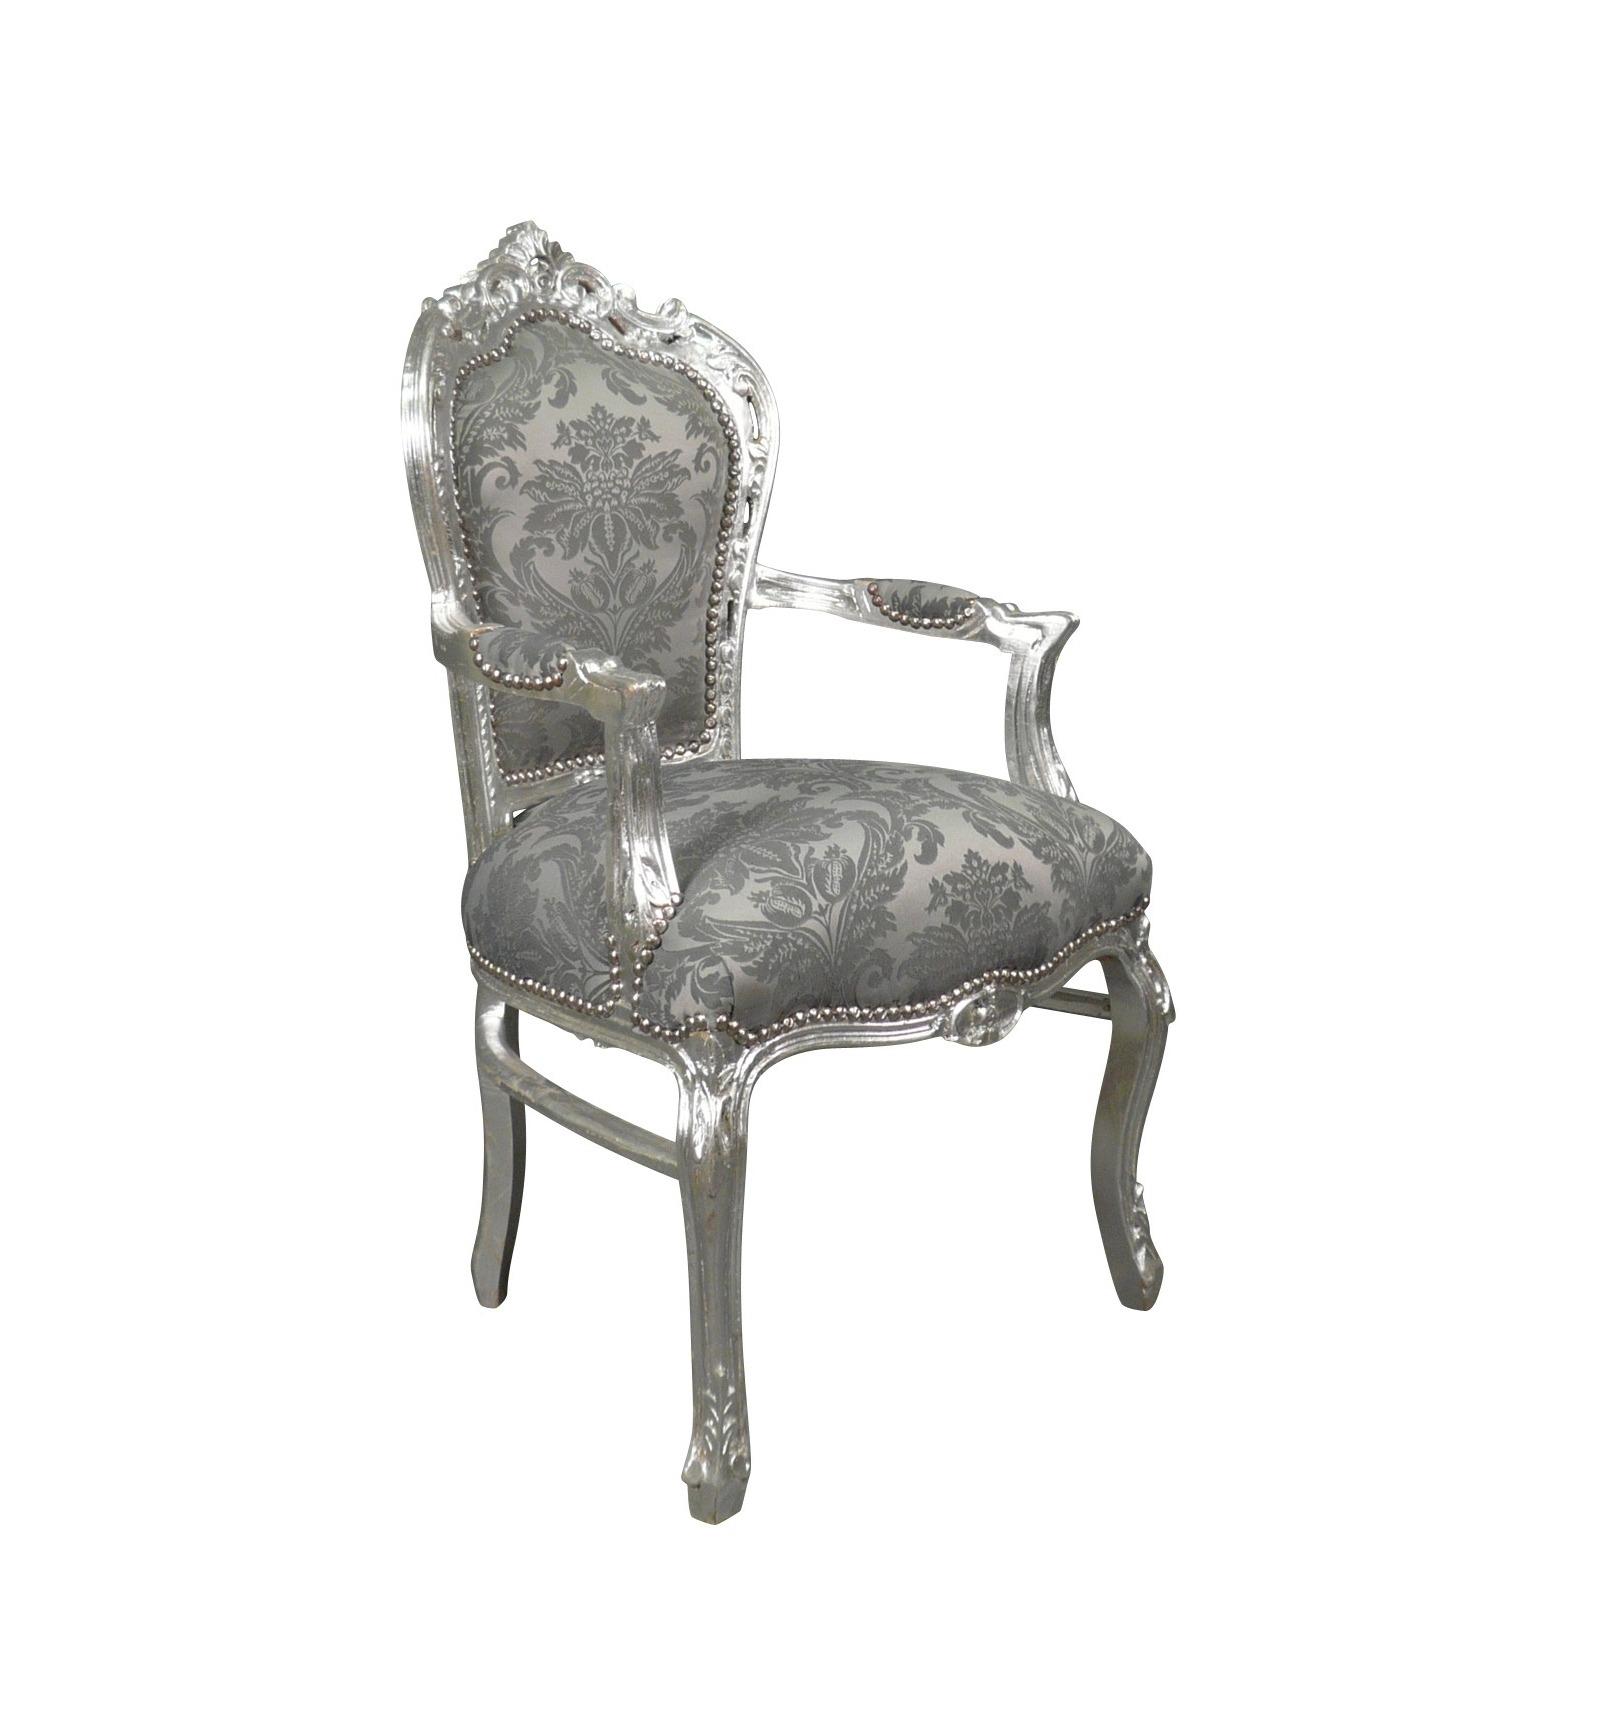 fauteuil baroque en tissu gris rococo ameublement baroque. Black Bedroom Furniture Sets. Home Design Ideas